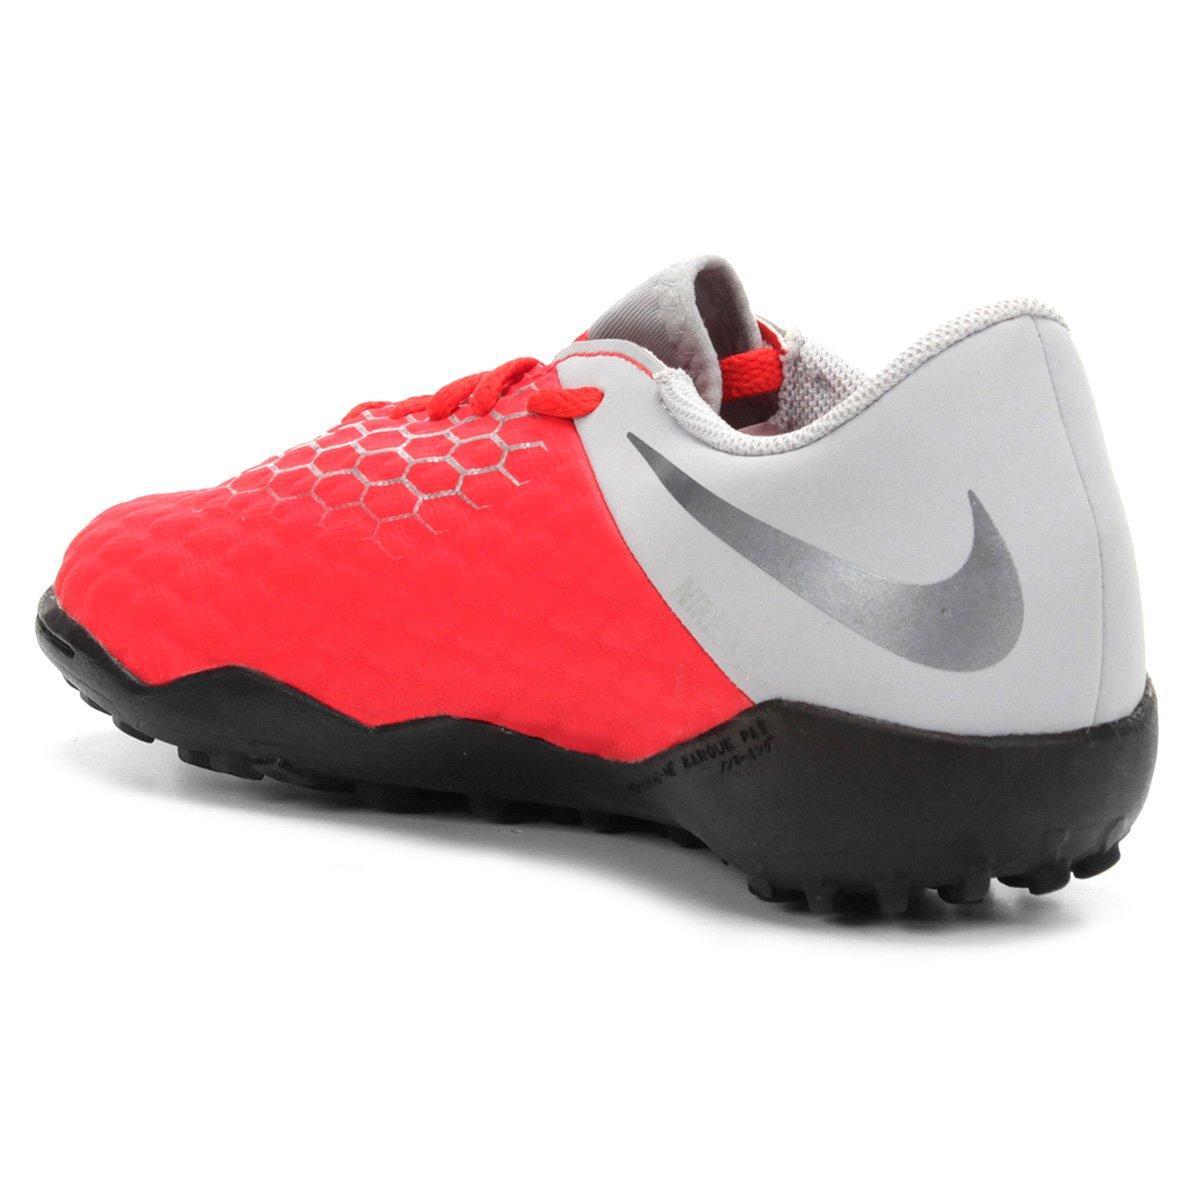 Chuteira Society Infantil Nike Hypervenom 3 Academy TF - Vermelho e ... d2813e23a2f7c